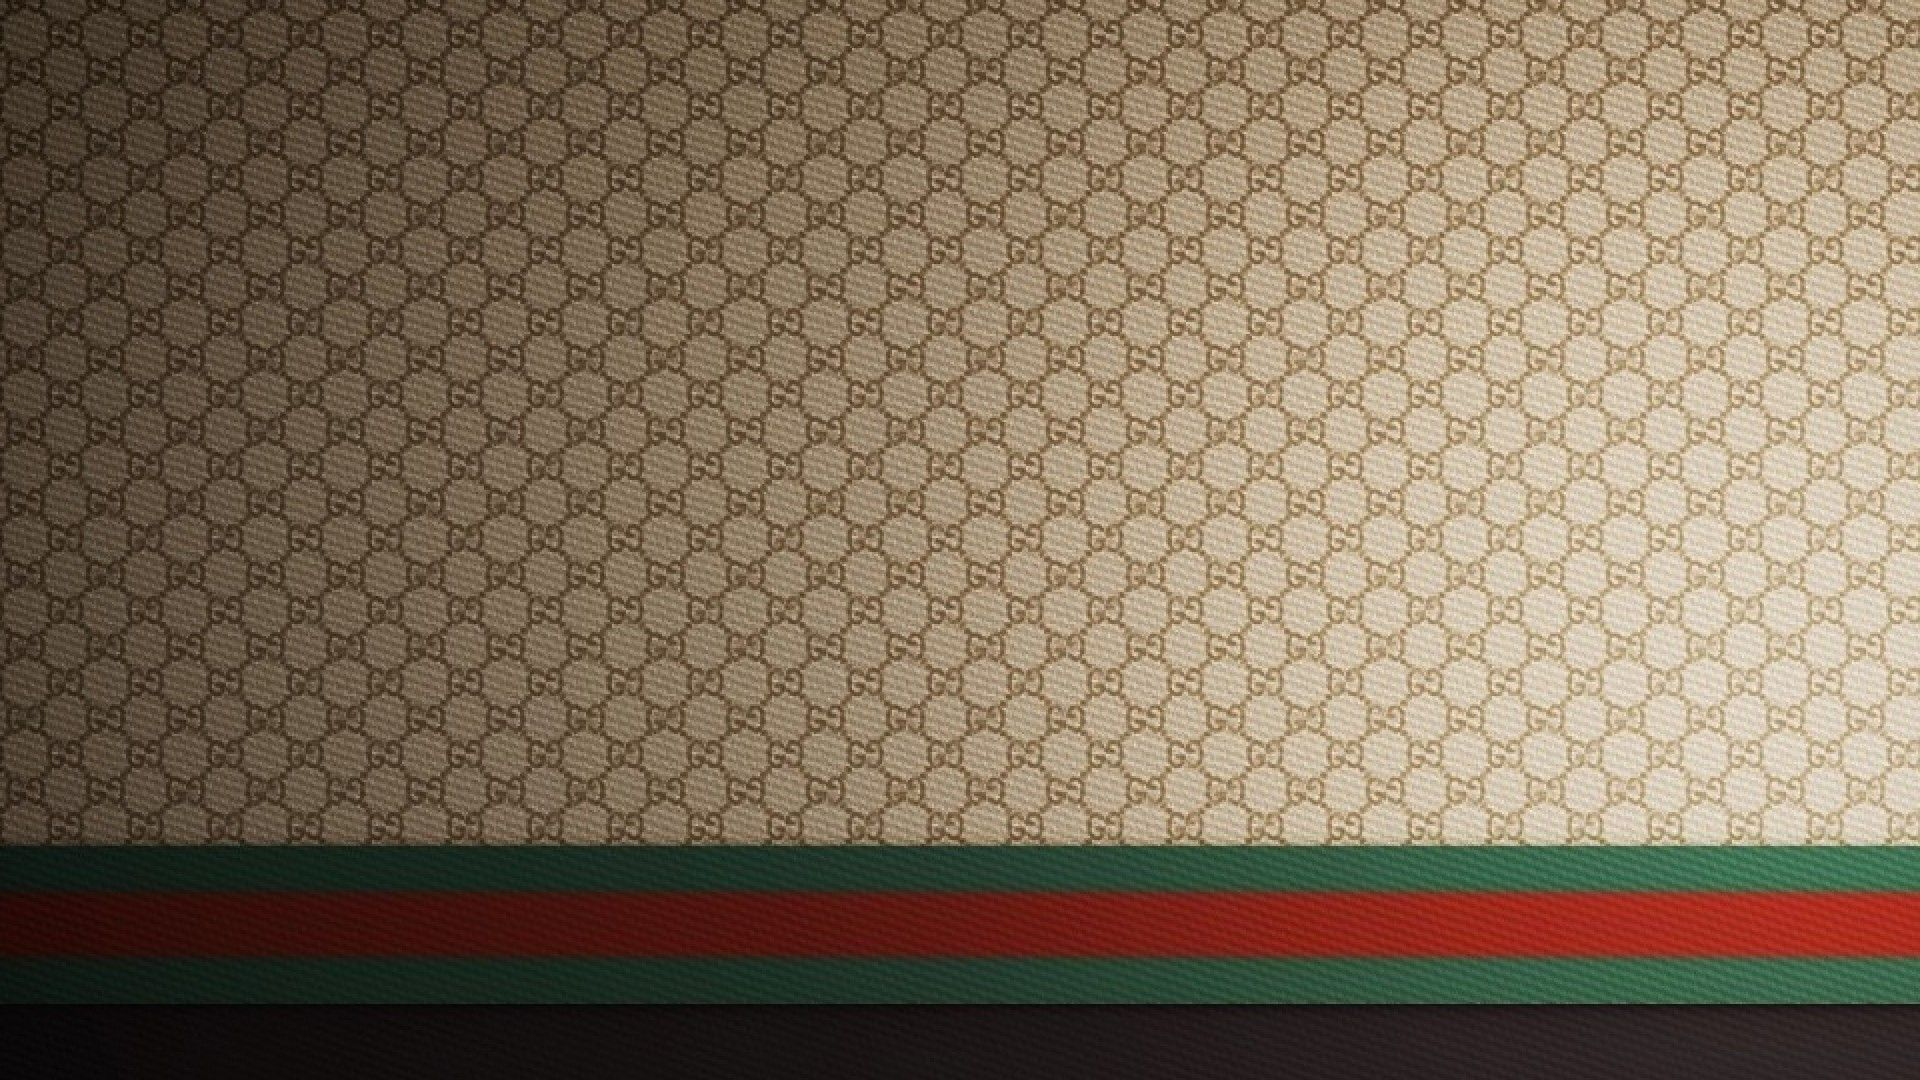 Cellphone Wallpaper Hd Gucci Wallpaper My Polyvore Finds Pinterest Gucci